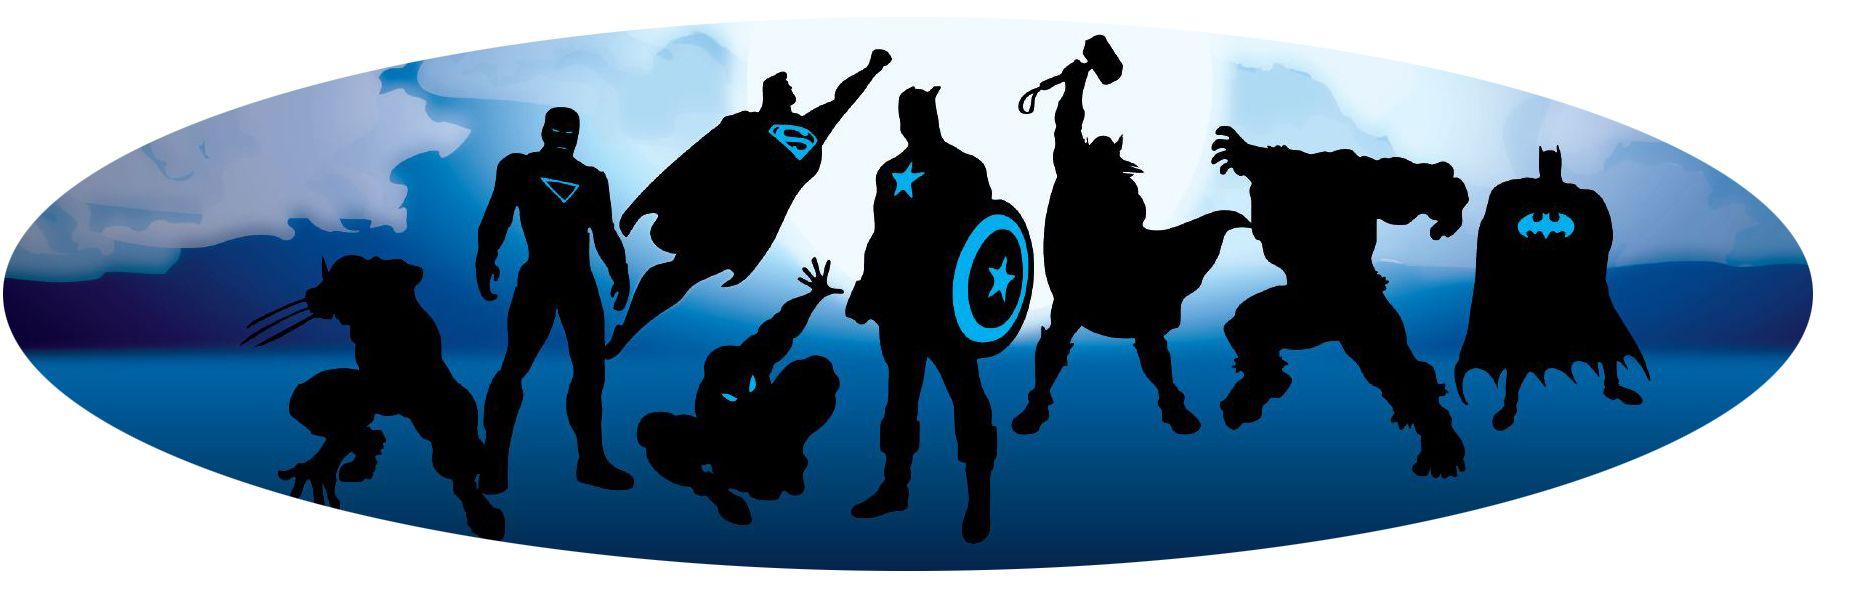 super hero silhouettes | MARVEL | Pinterest | Superheroes